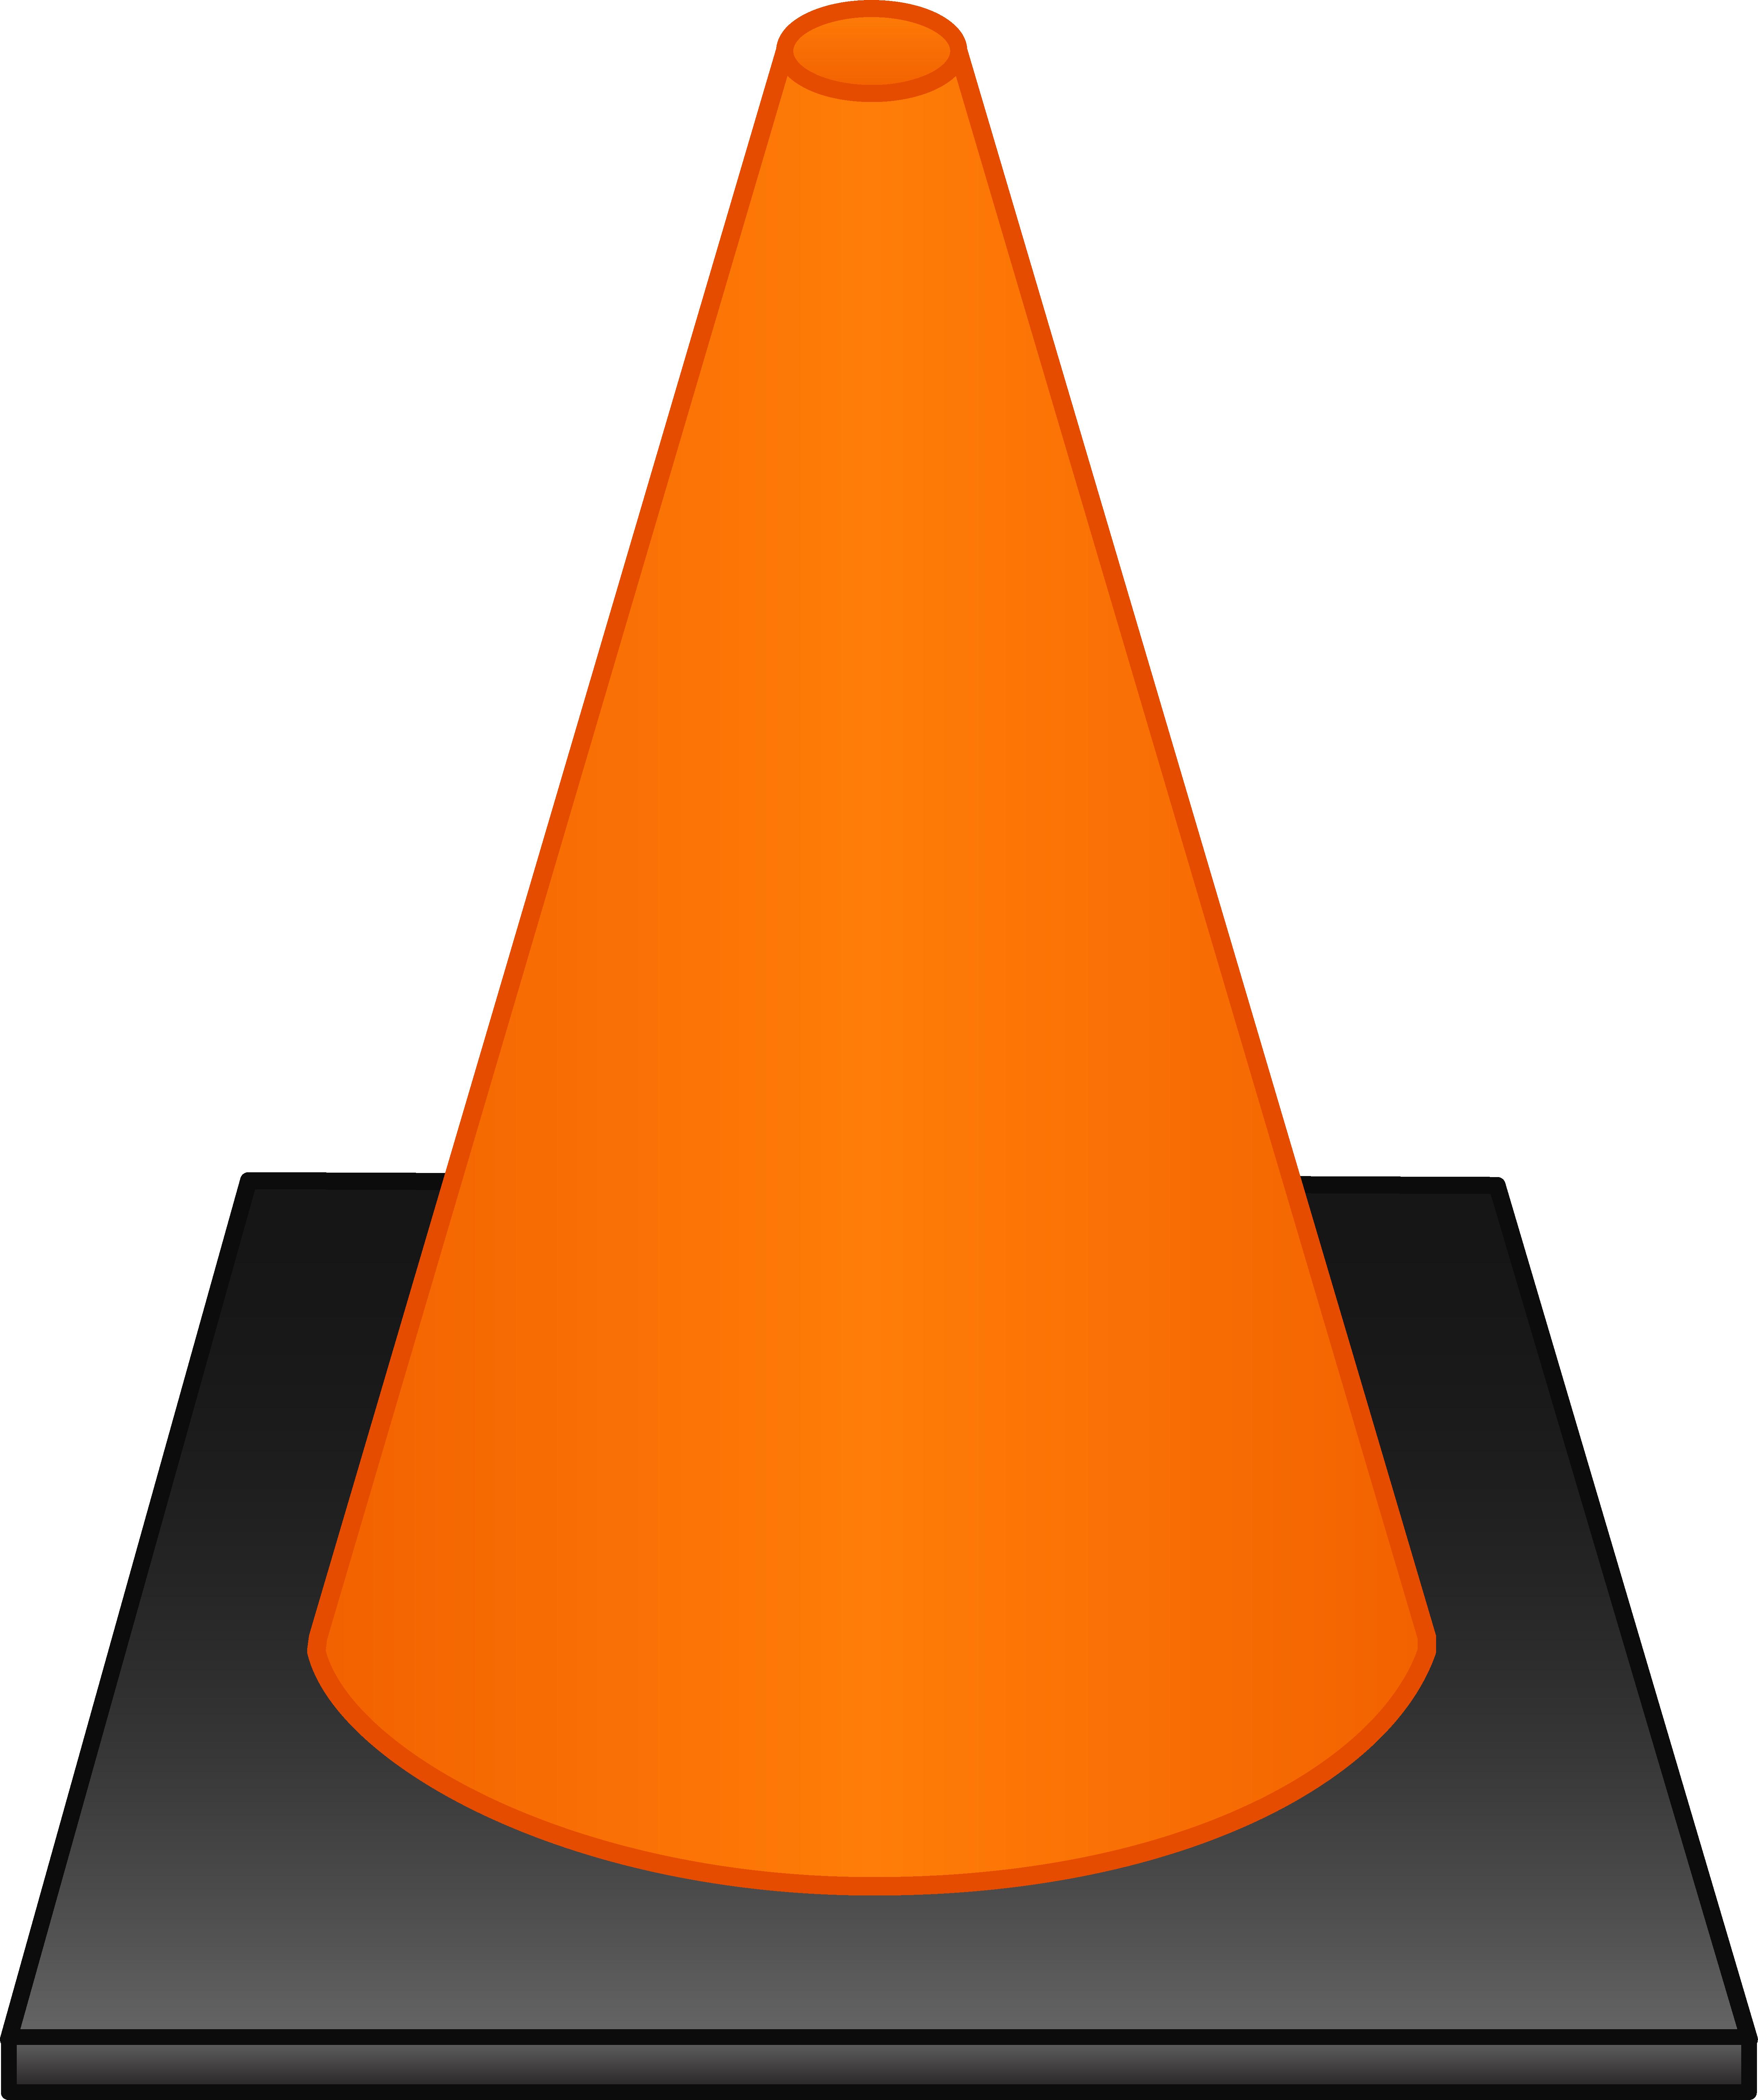 5139x6139 Wallpaper And Desktop For Pc Orange Traffic Cone Free Clip Art